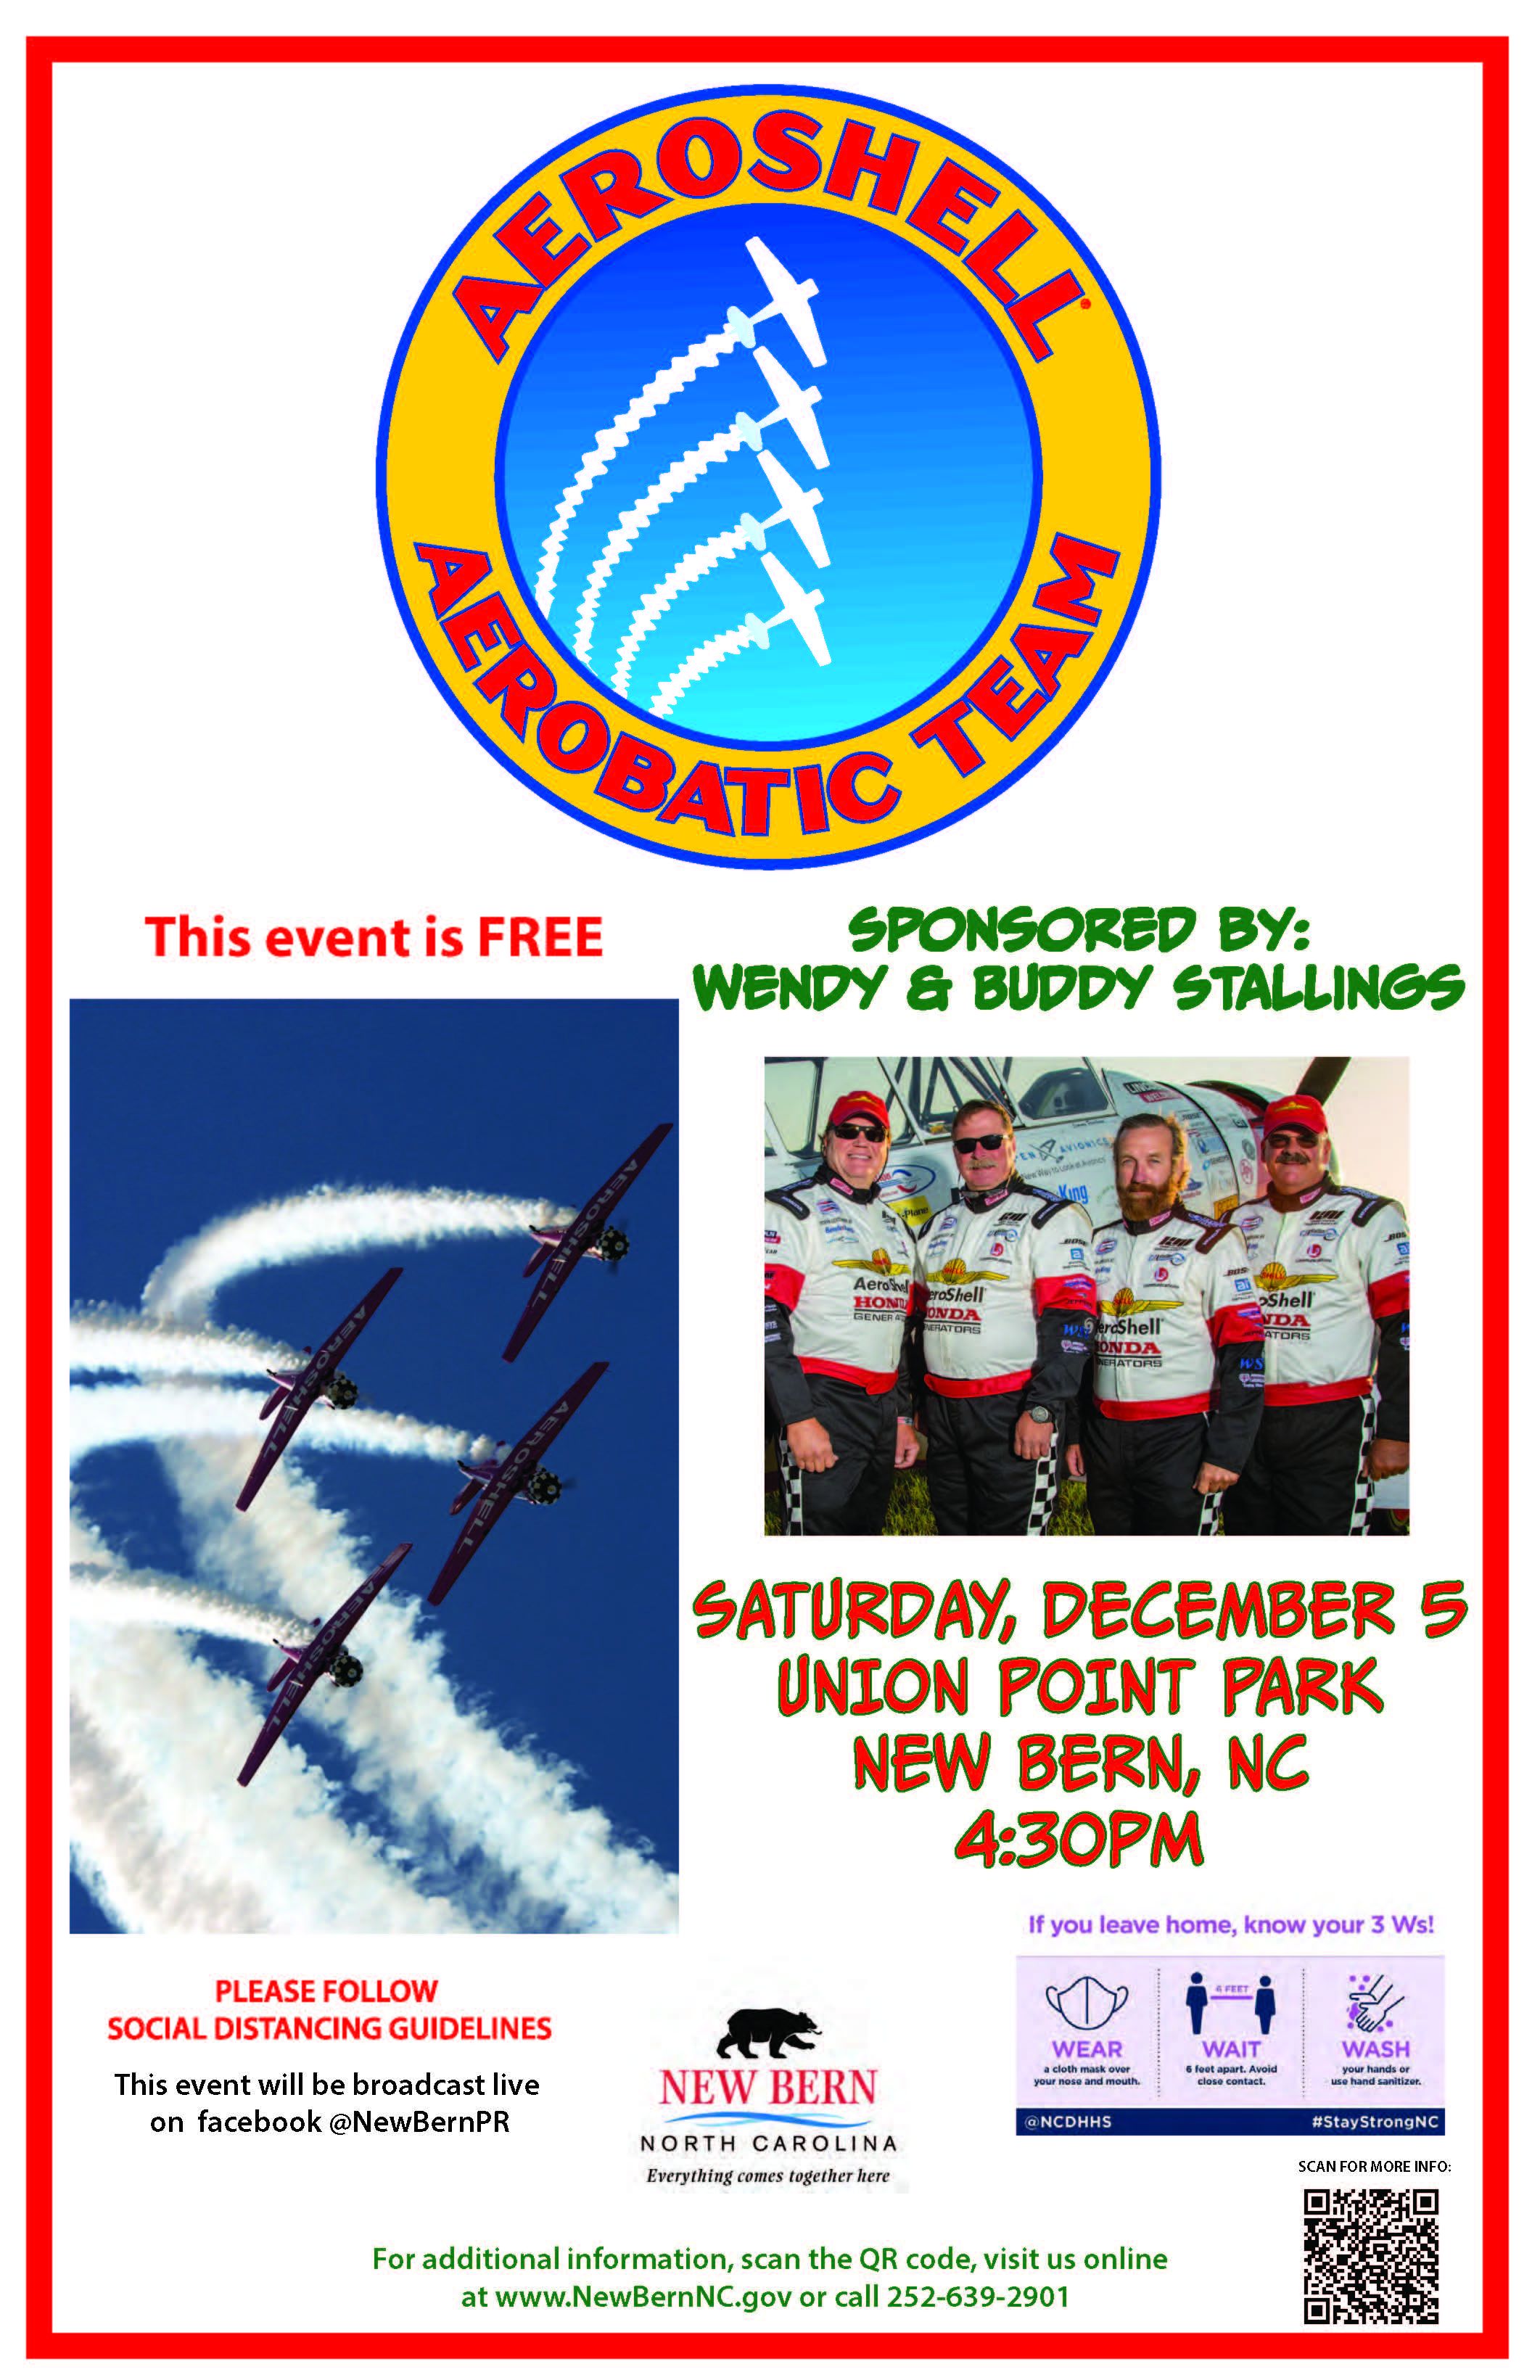 AeroShell Aerobatic Team to Perform Night Show in New Bern